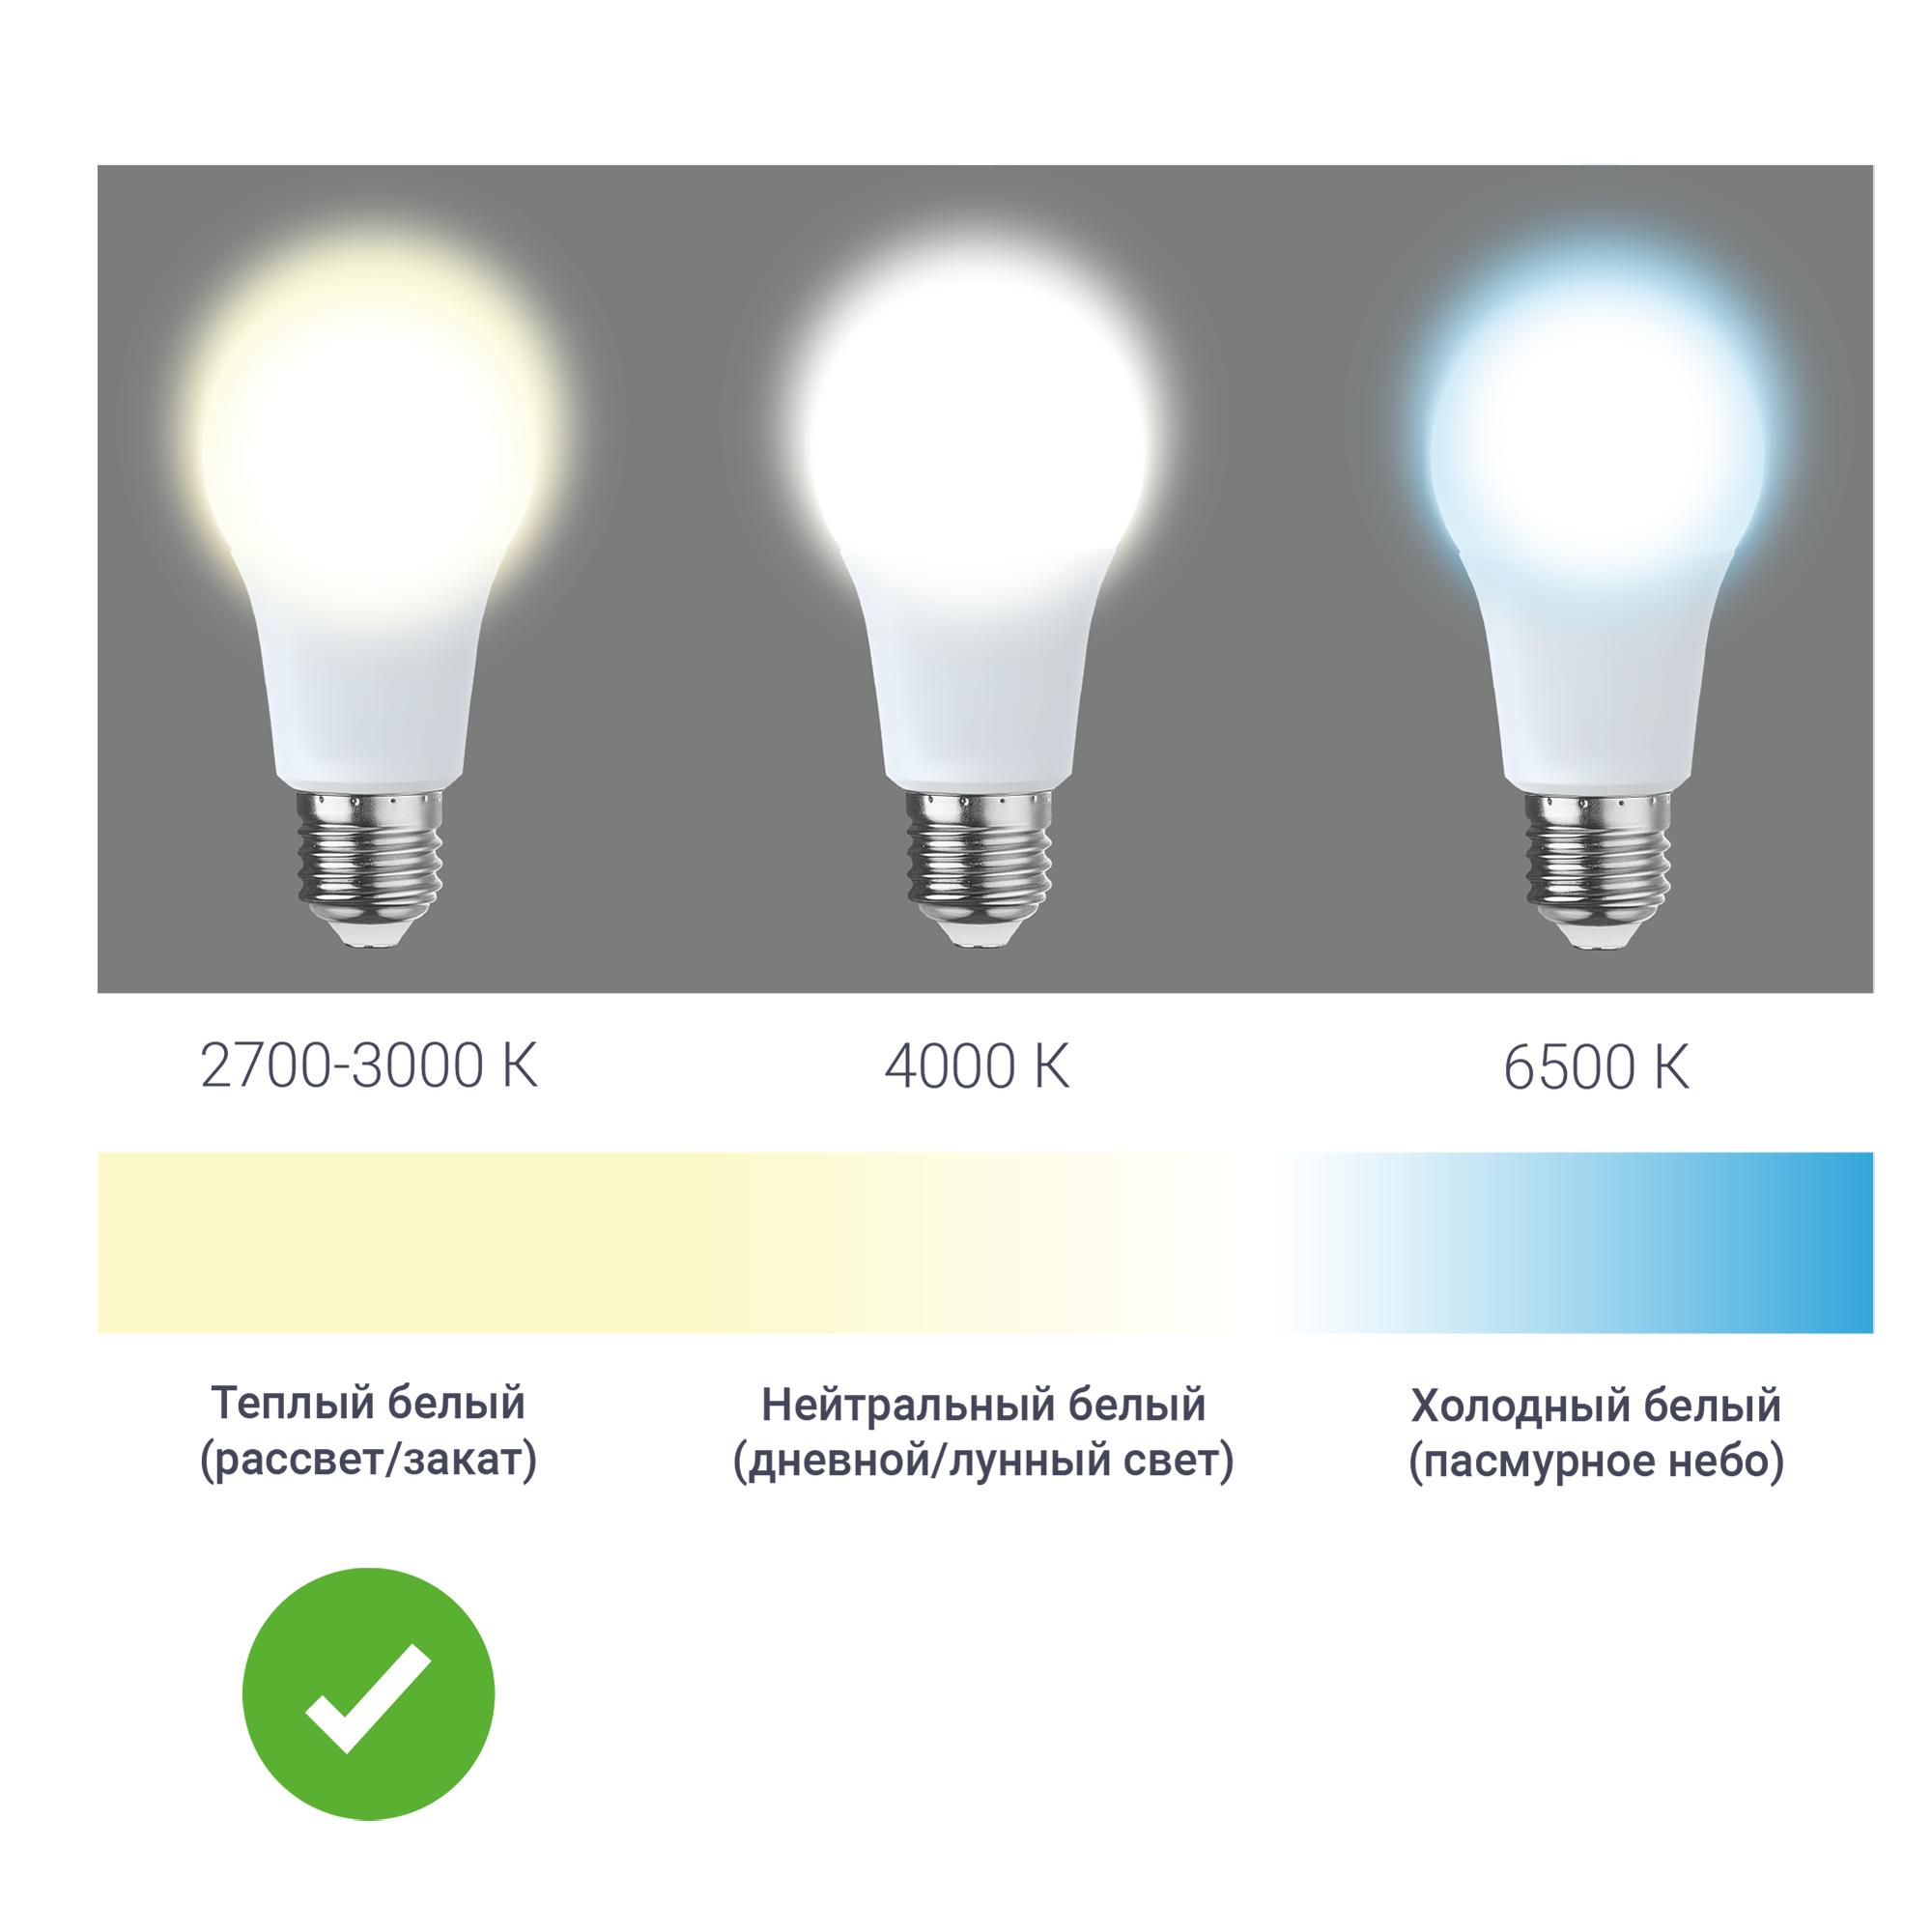 Лампа светодиодная Osram груша E14 4 Вт 470 Лм свет тёплый белый прозрачная